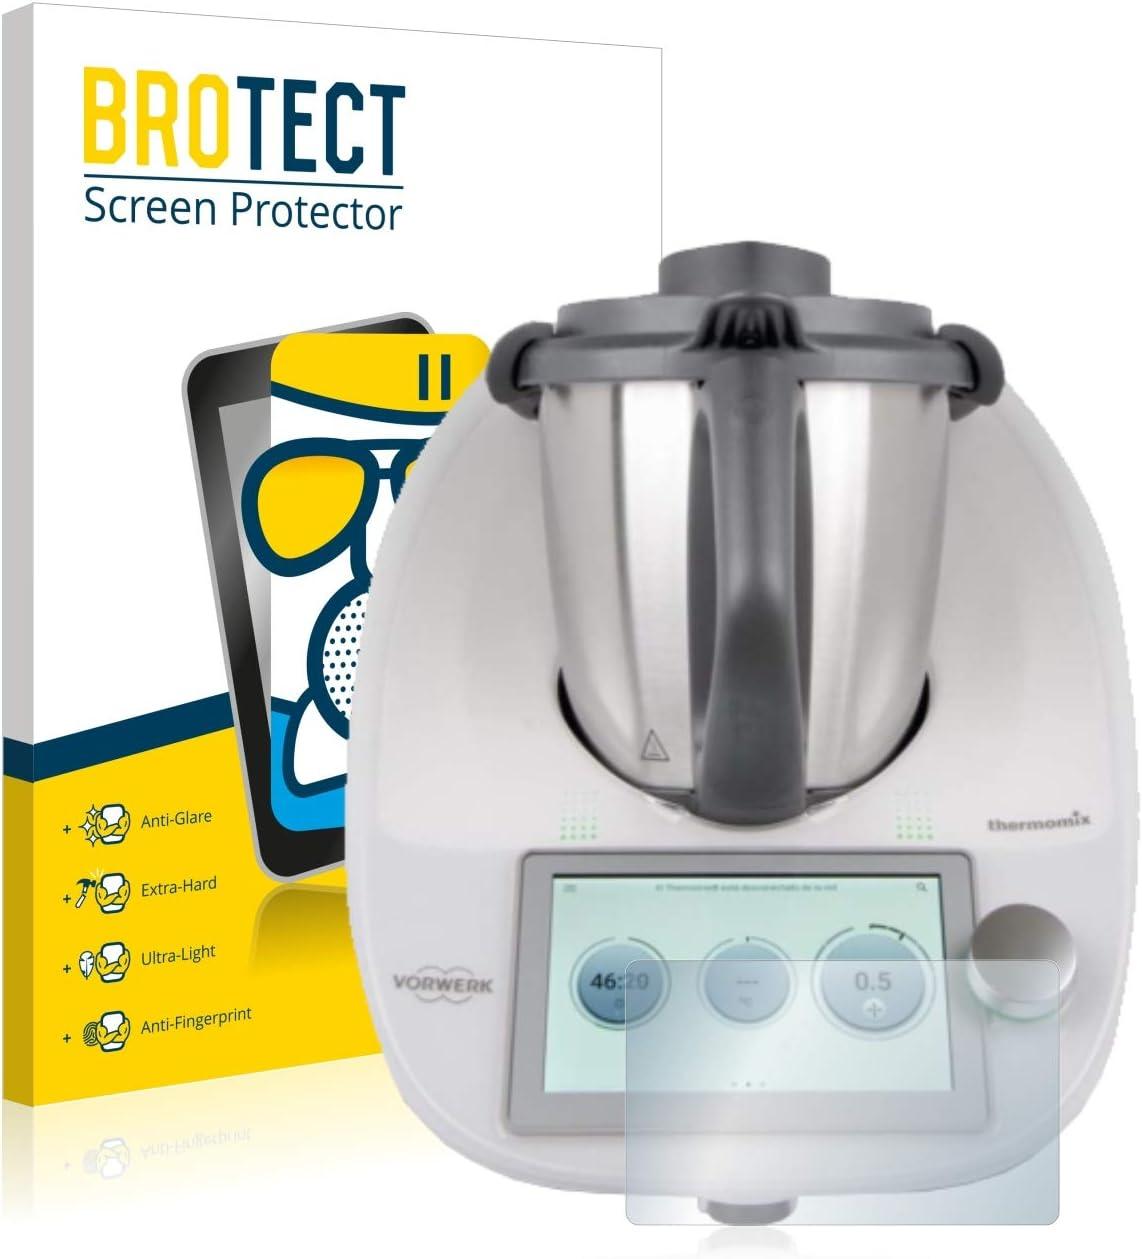 BROTECT Protector Pantalla Cristal Mate Compatible con Vorwerk Thermomix TM6 Protector Pantalla Anti-Reflejos Vidrio, AirGlass: Amazon.es: Electrónica